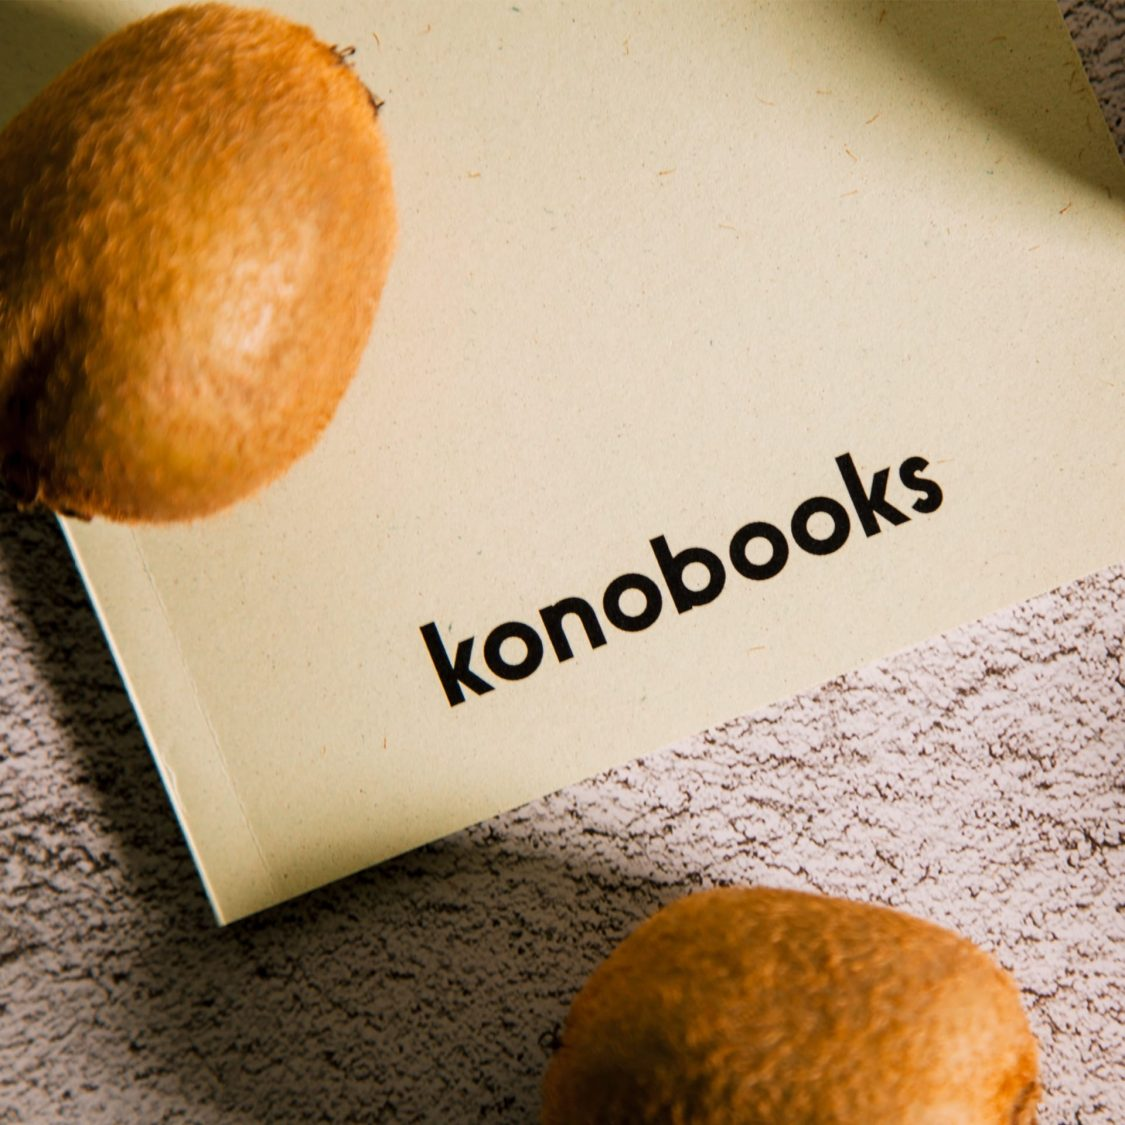 Taccuino A5 ecologico in carta Kiwi certificata FSC - Konobooks